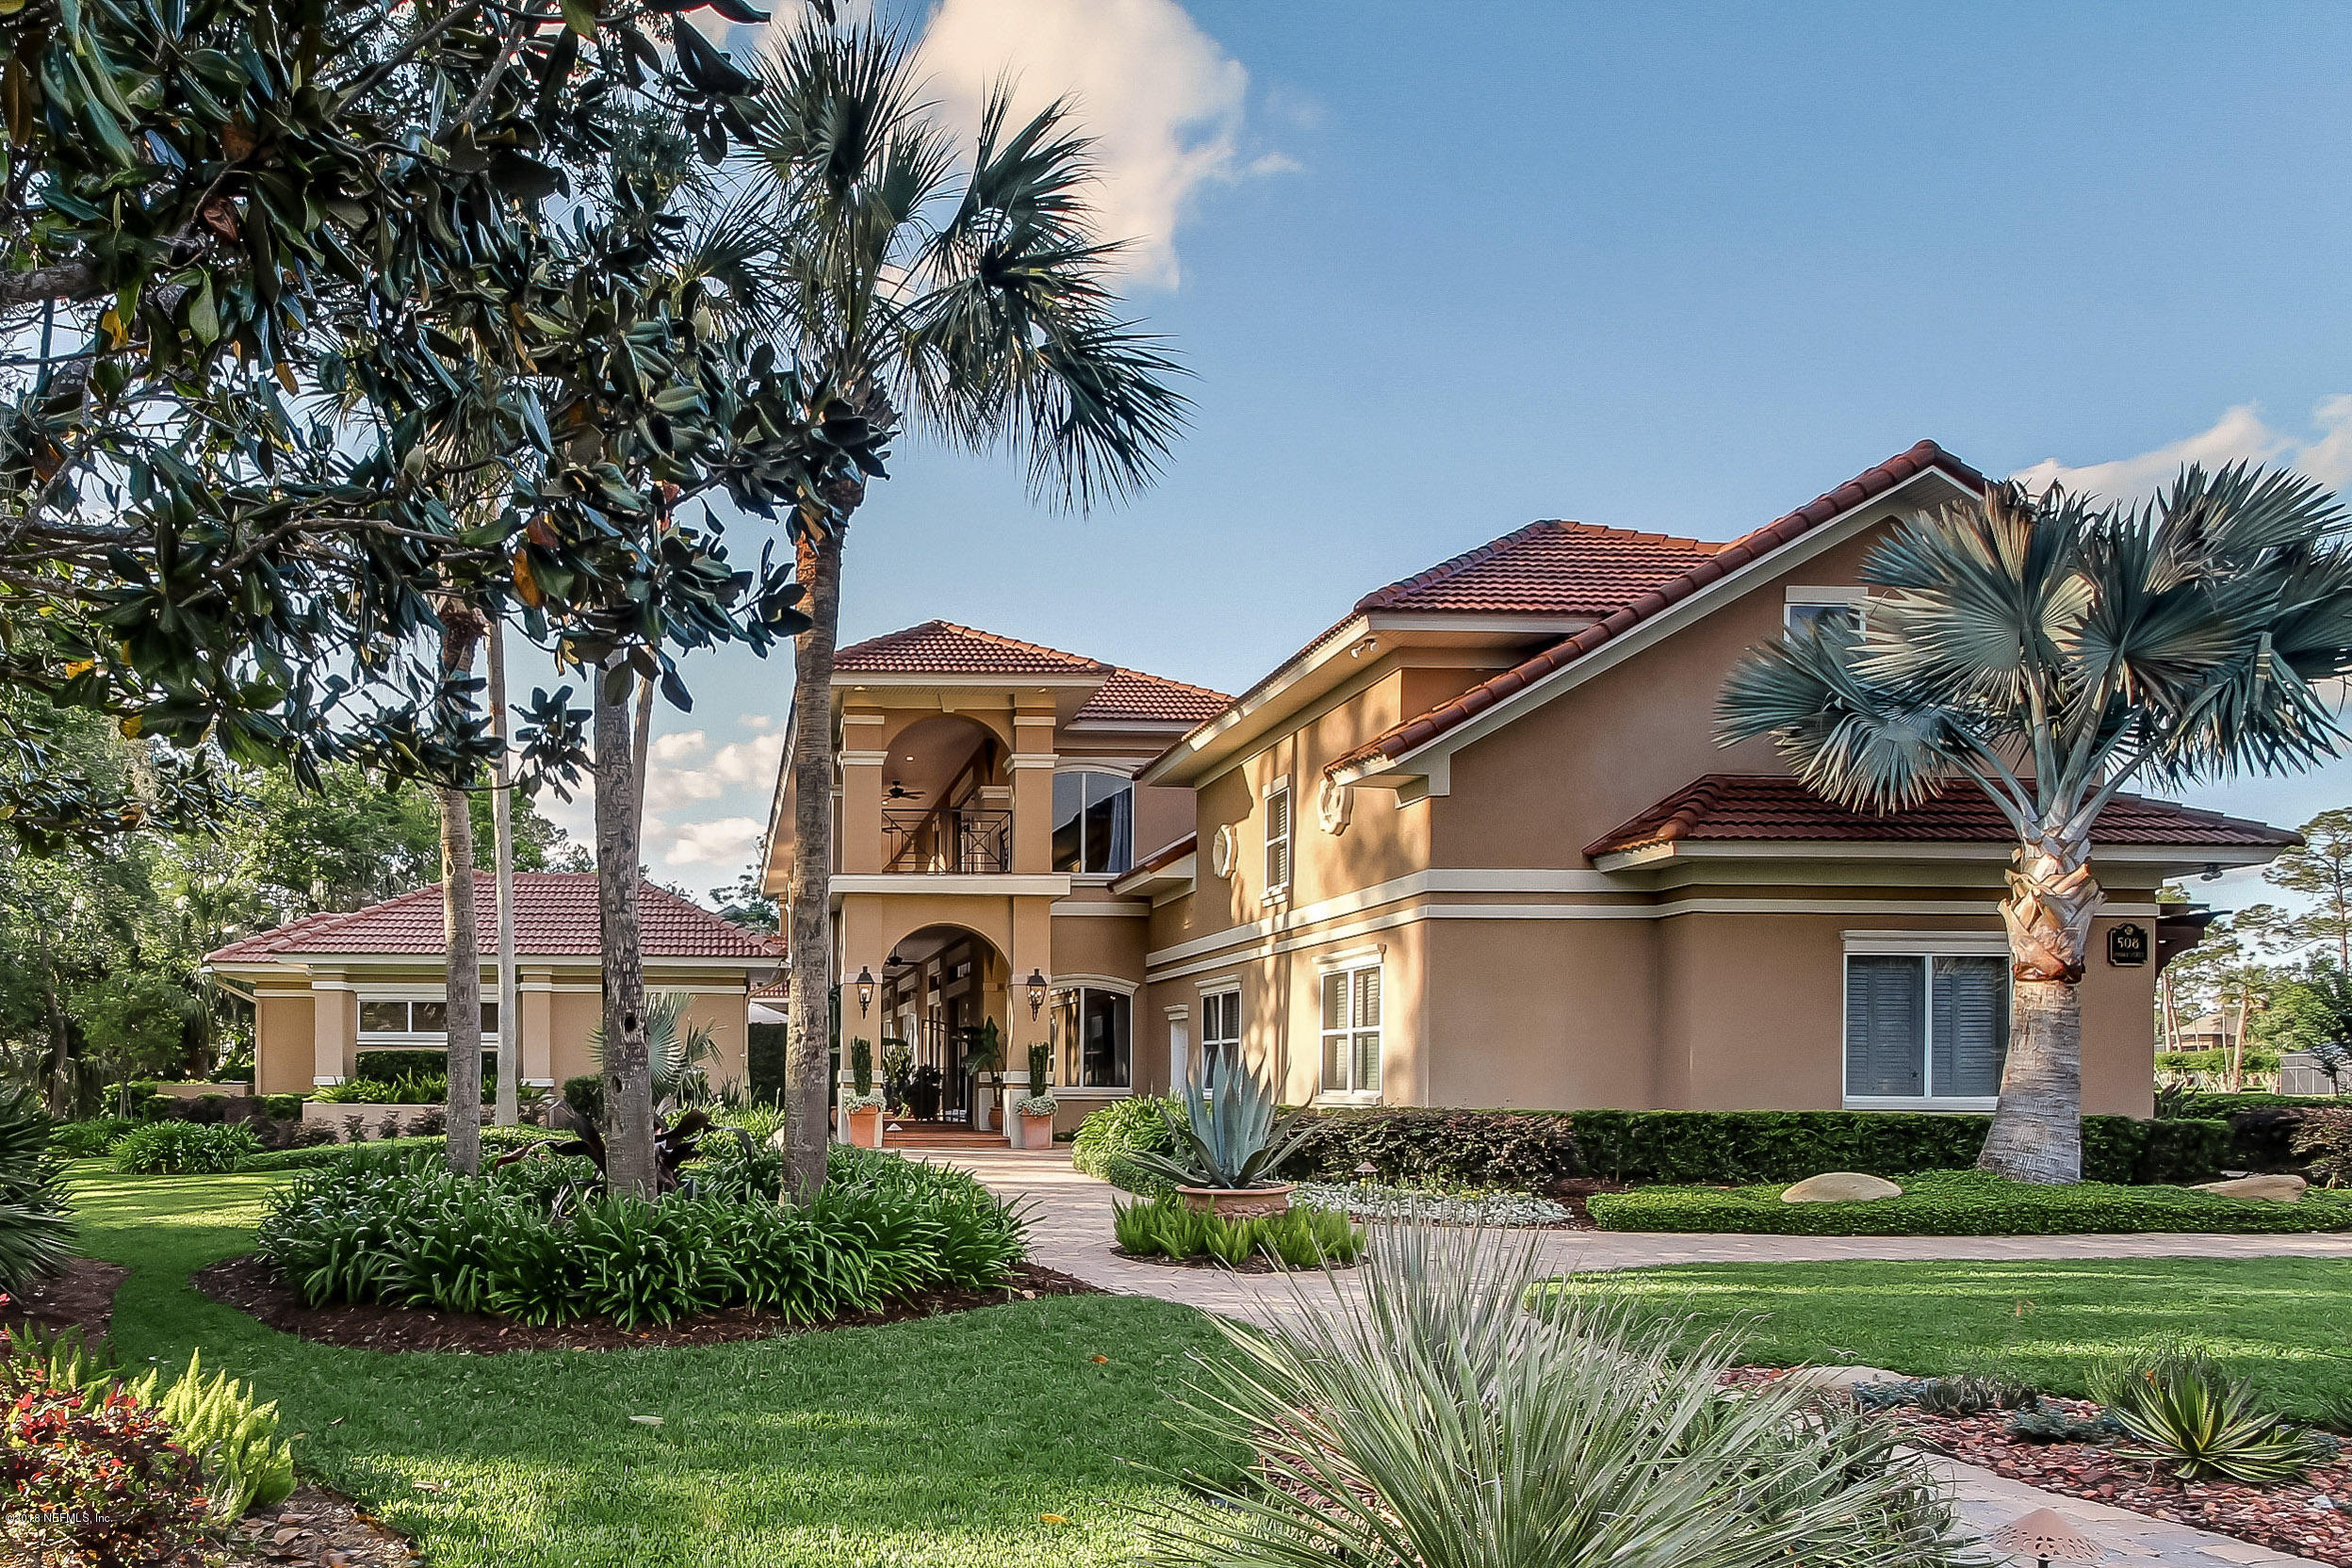 508 SNOWY EGRET, PONTE VEDRA BEACH, FLORIDA 32082, 5 Bedrooms Bedrooms, ,5 BathroomsBathrooms,Residential - single family,For sale,SNOWY EGRET,977542